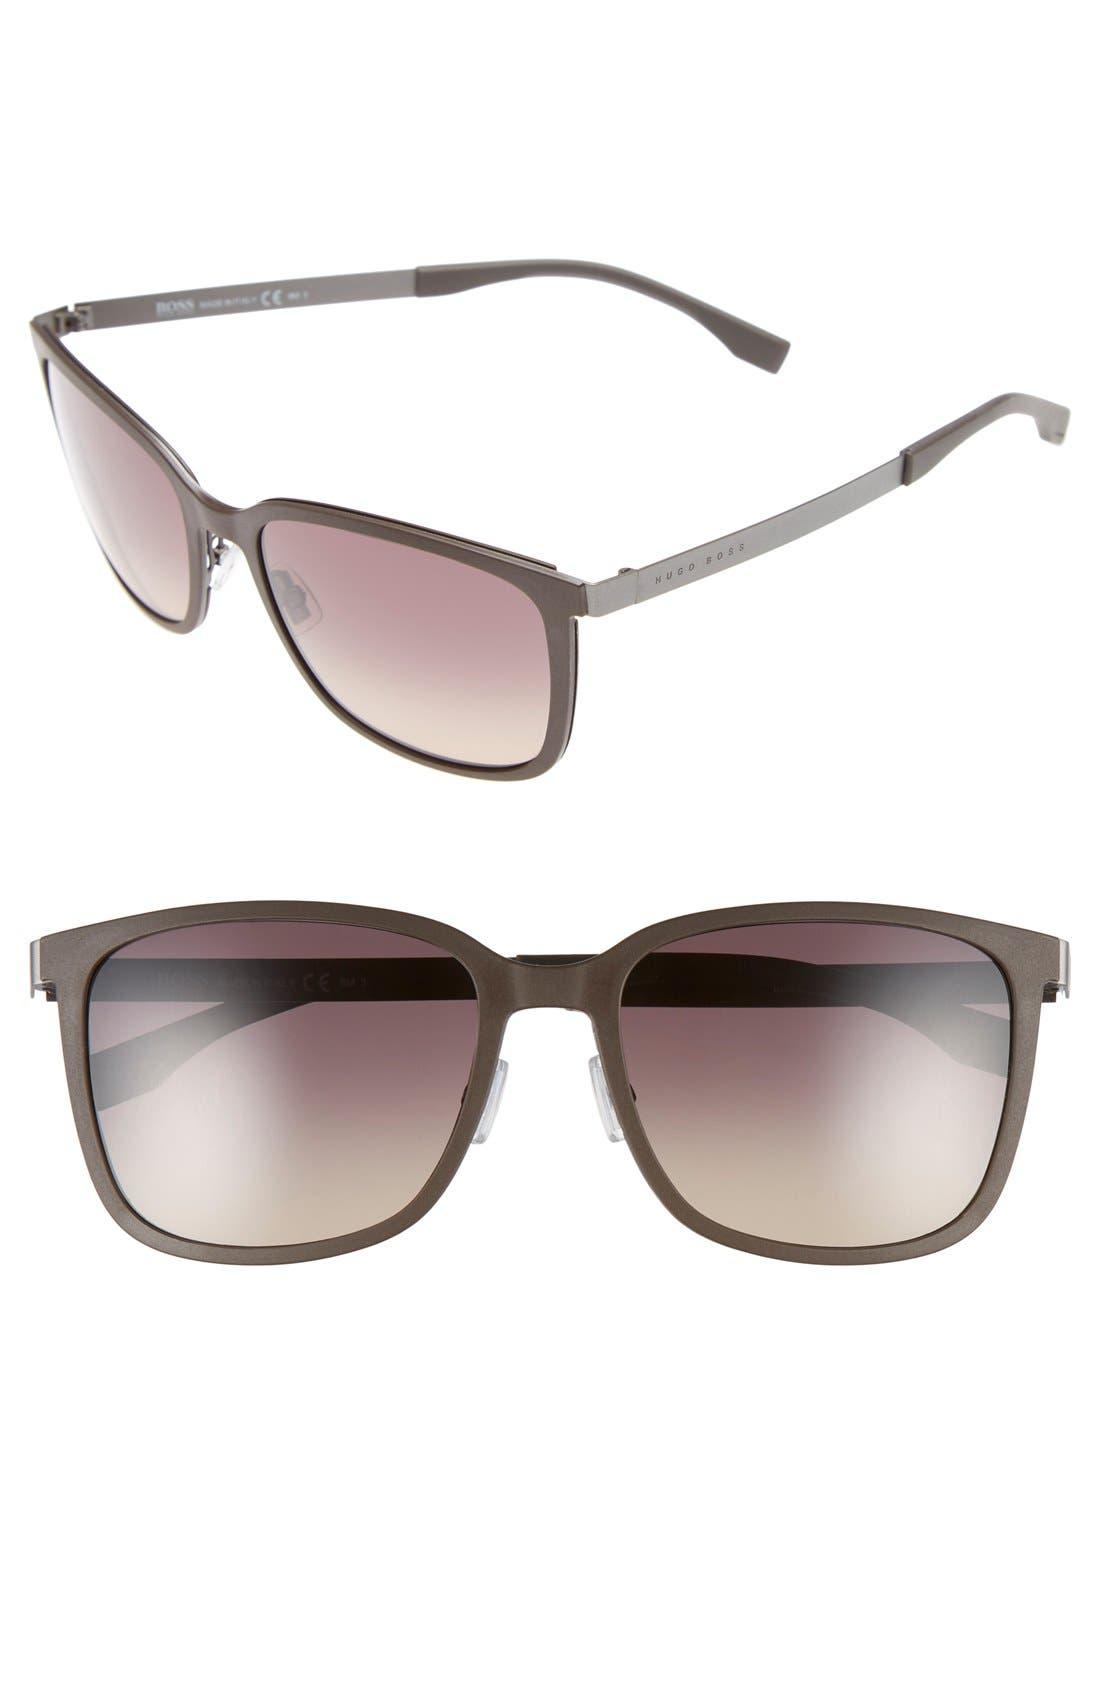 Main Image - BOSS 56mm Retro Sunglasses